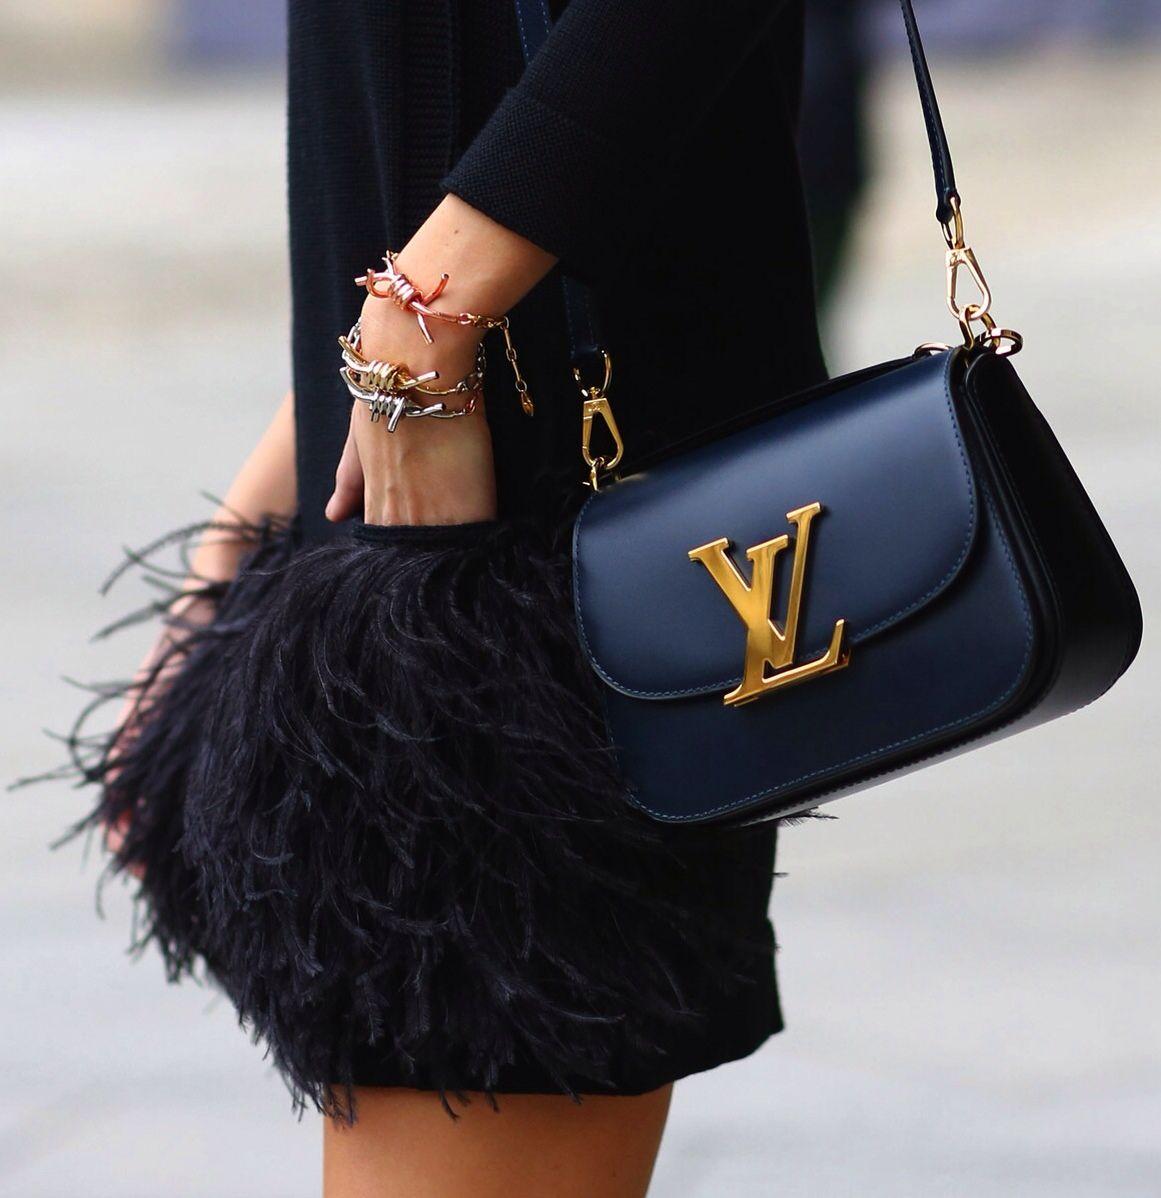 feather skirt + bag